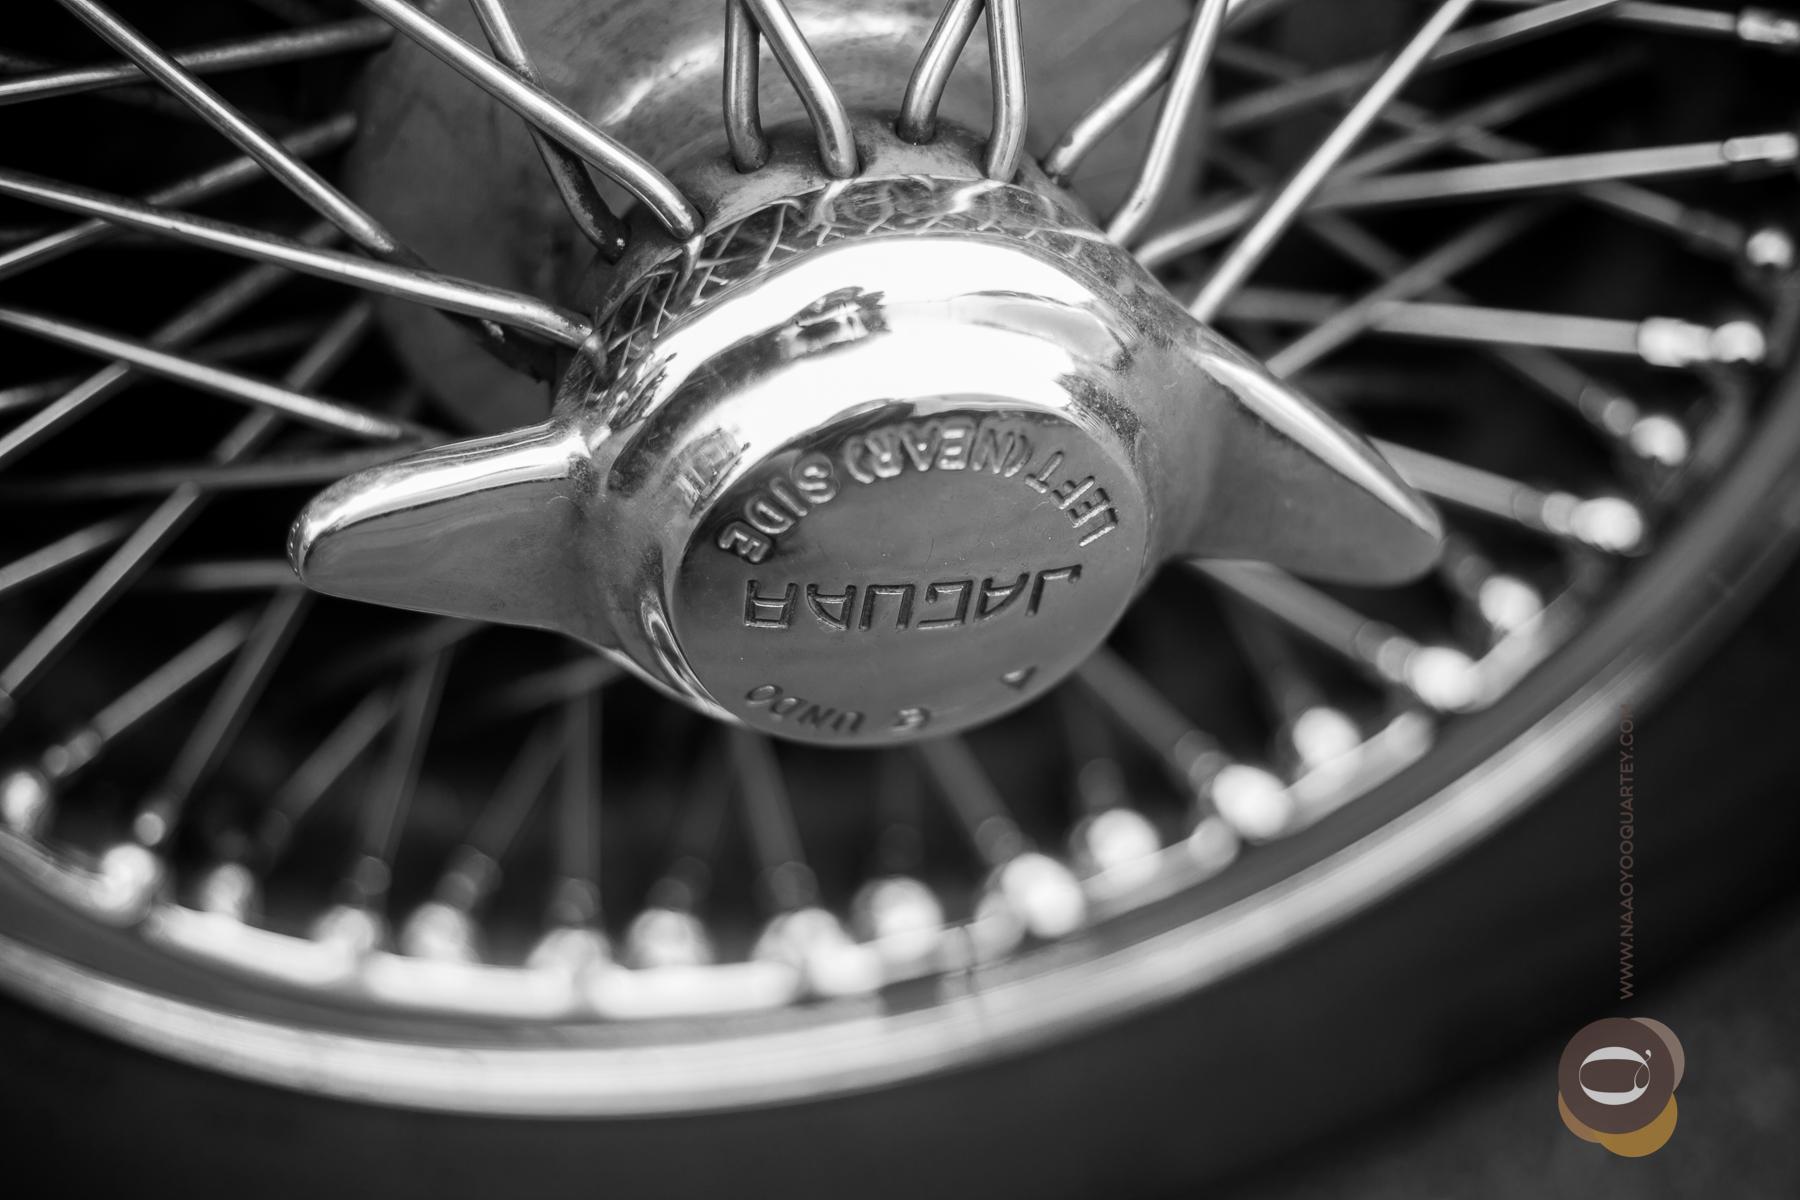 Wheel of Jaguar MARK 2